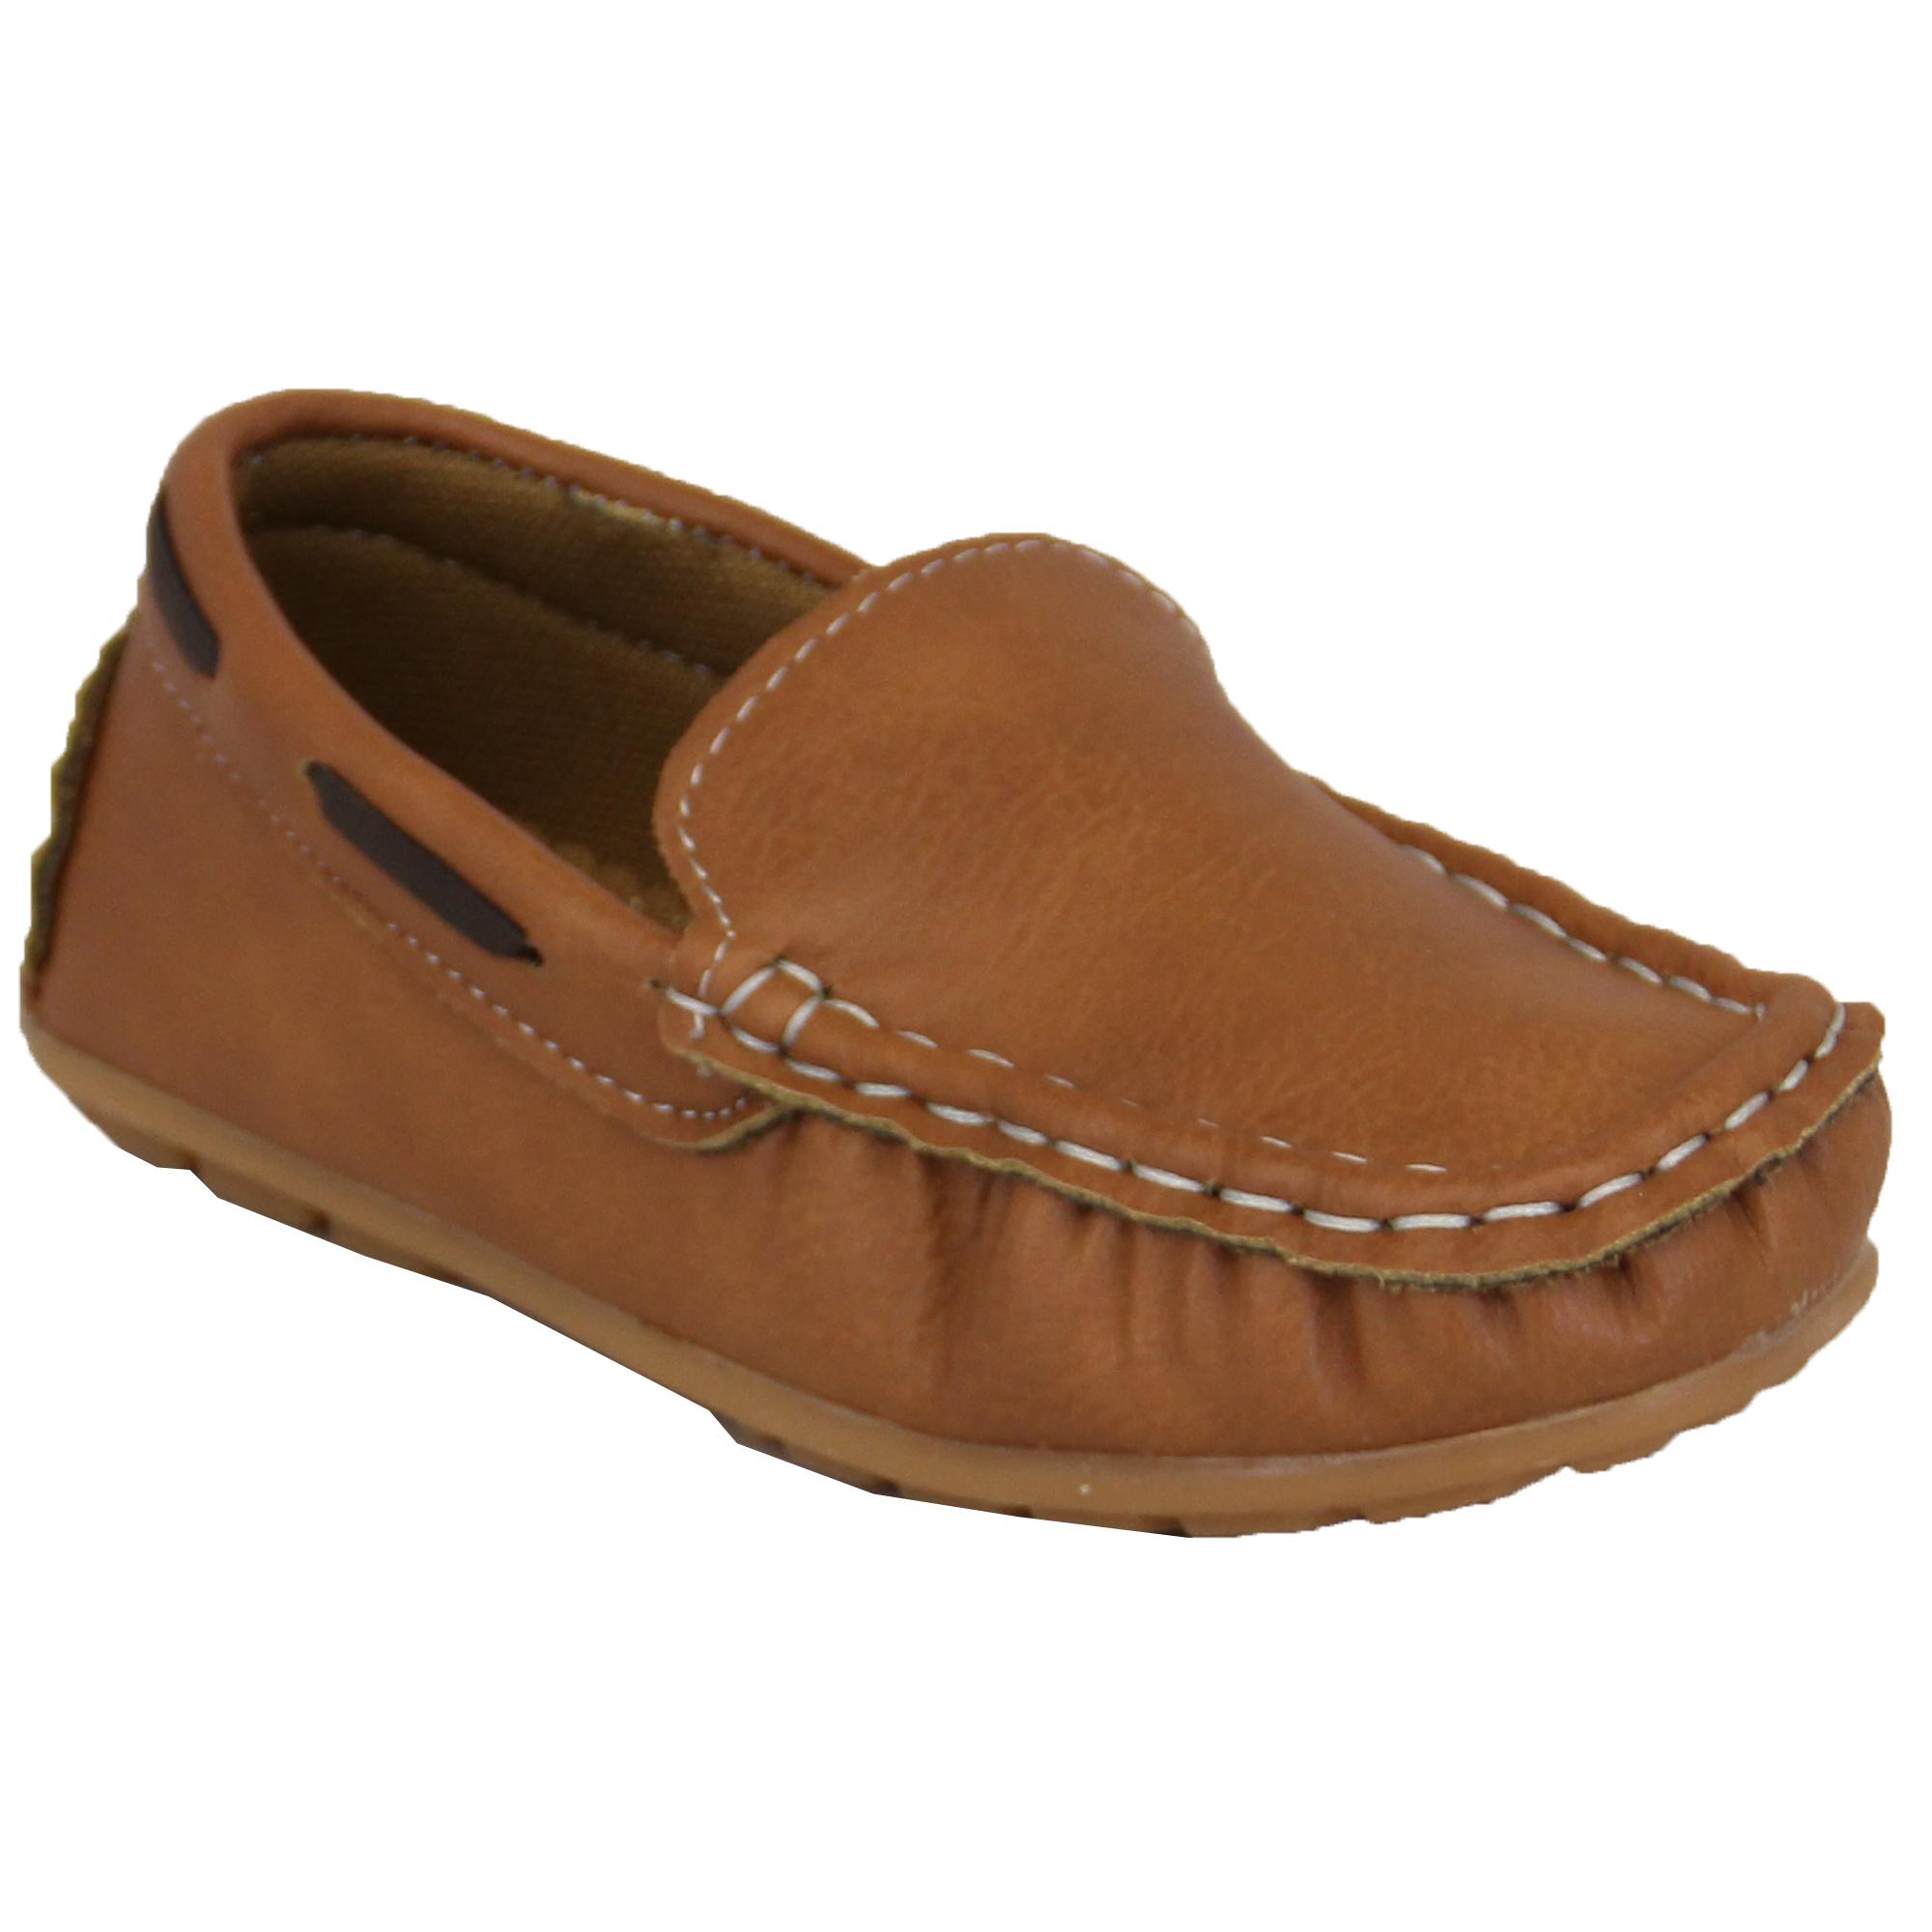 Slip On Deck Shoes Boys